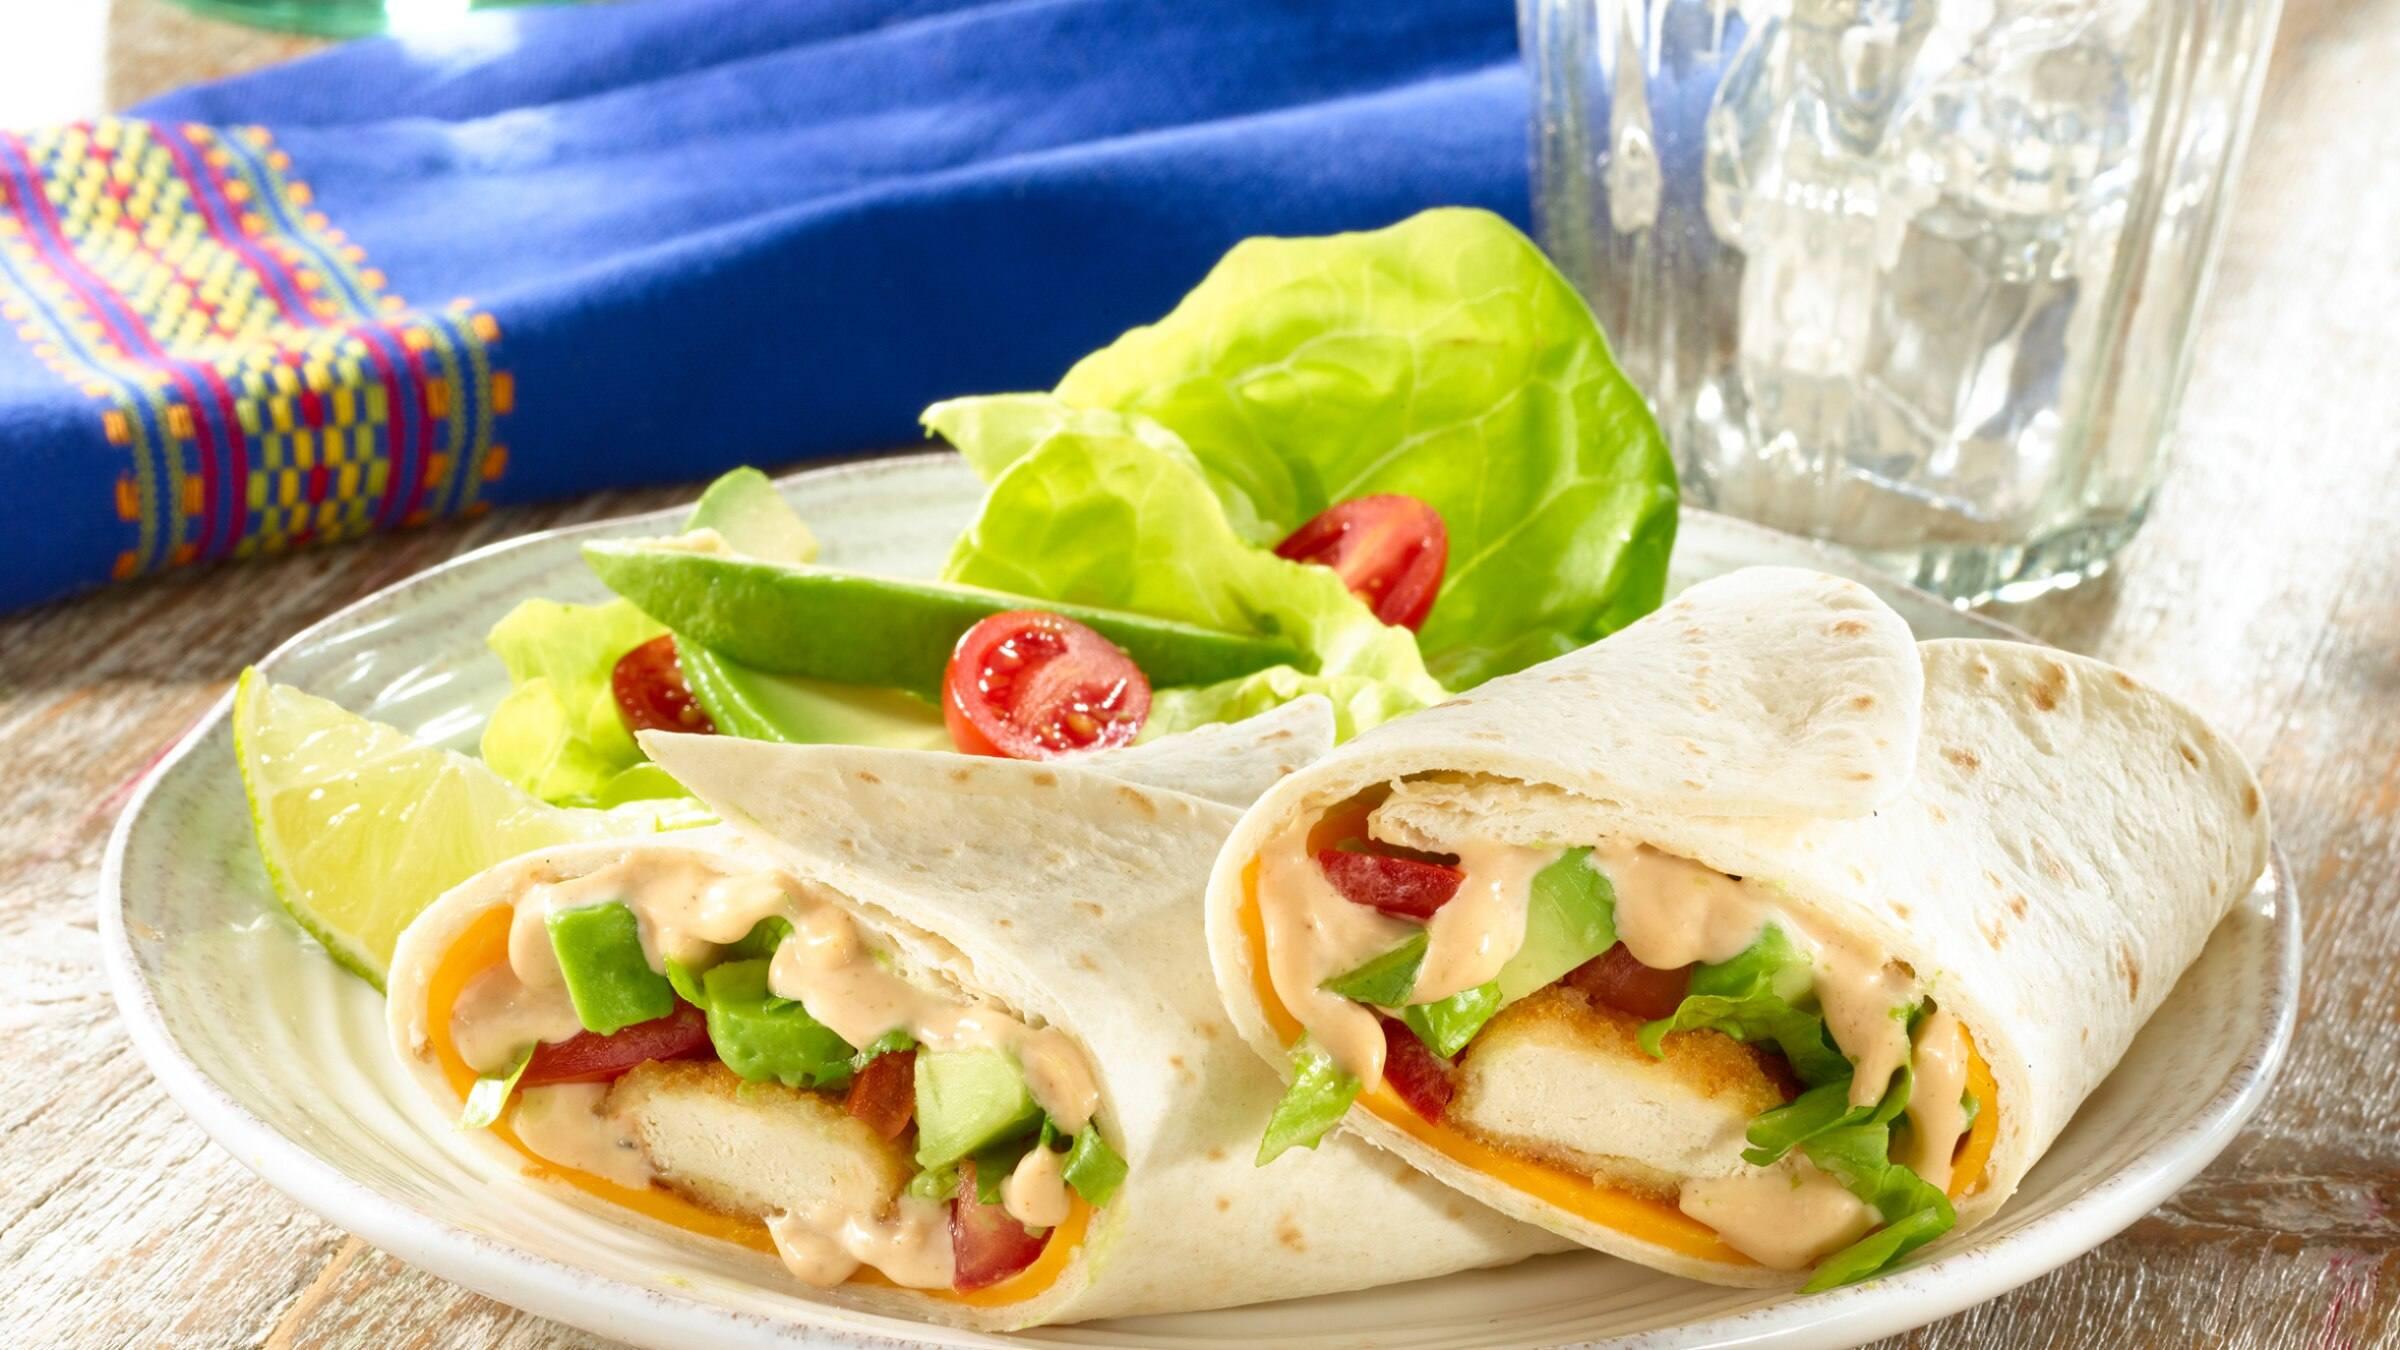 BBQ Chicken & Cheddar Wraps Recipe